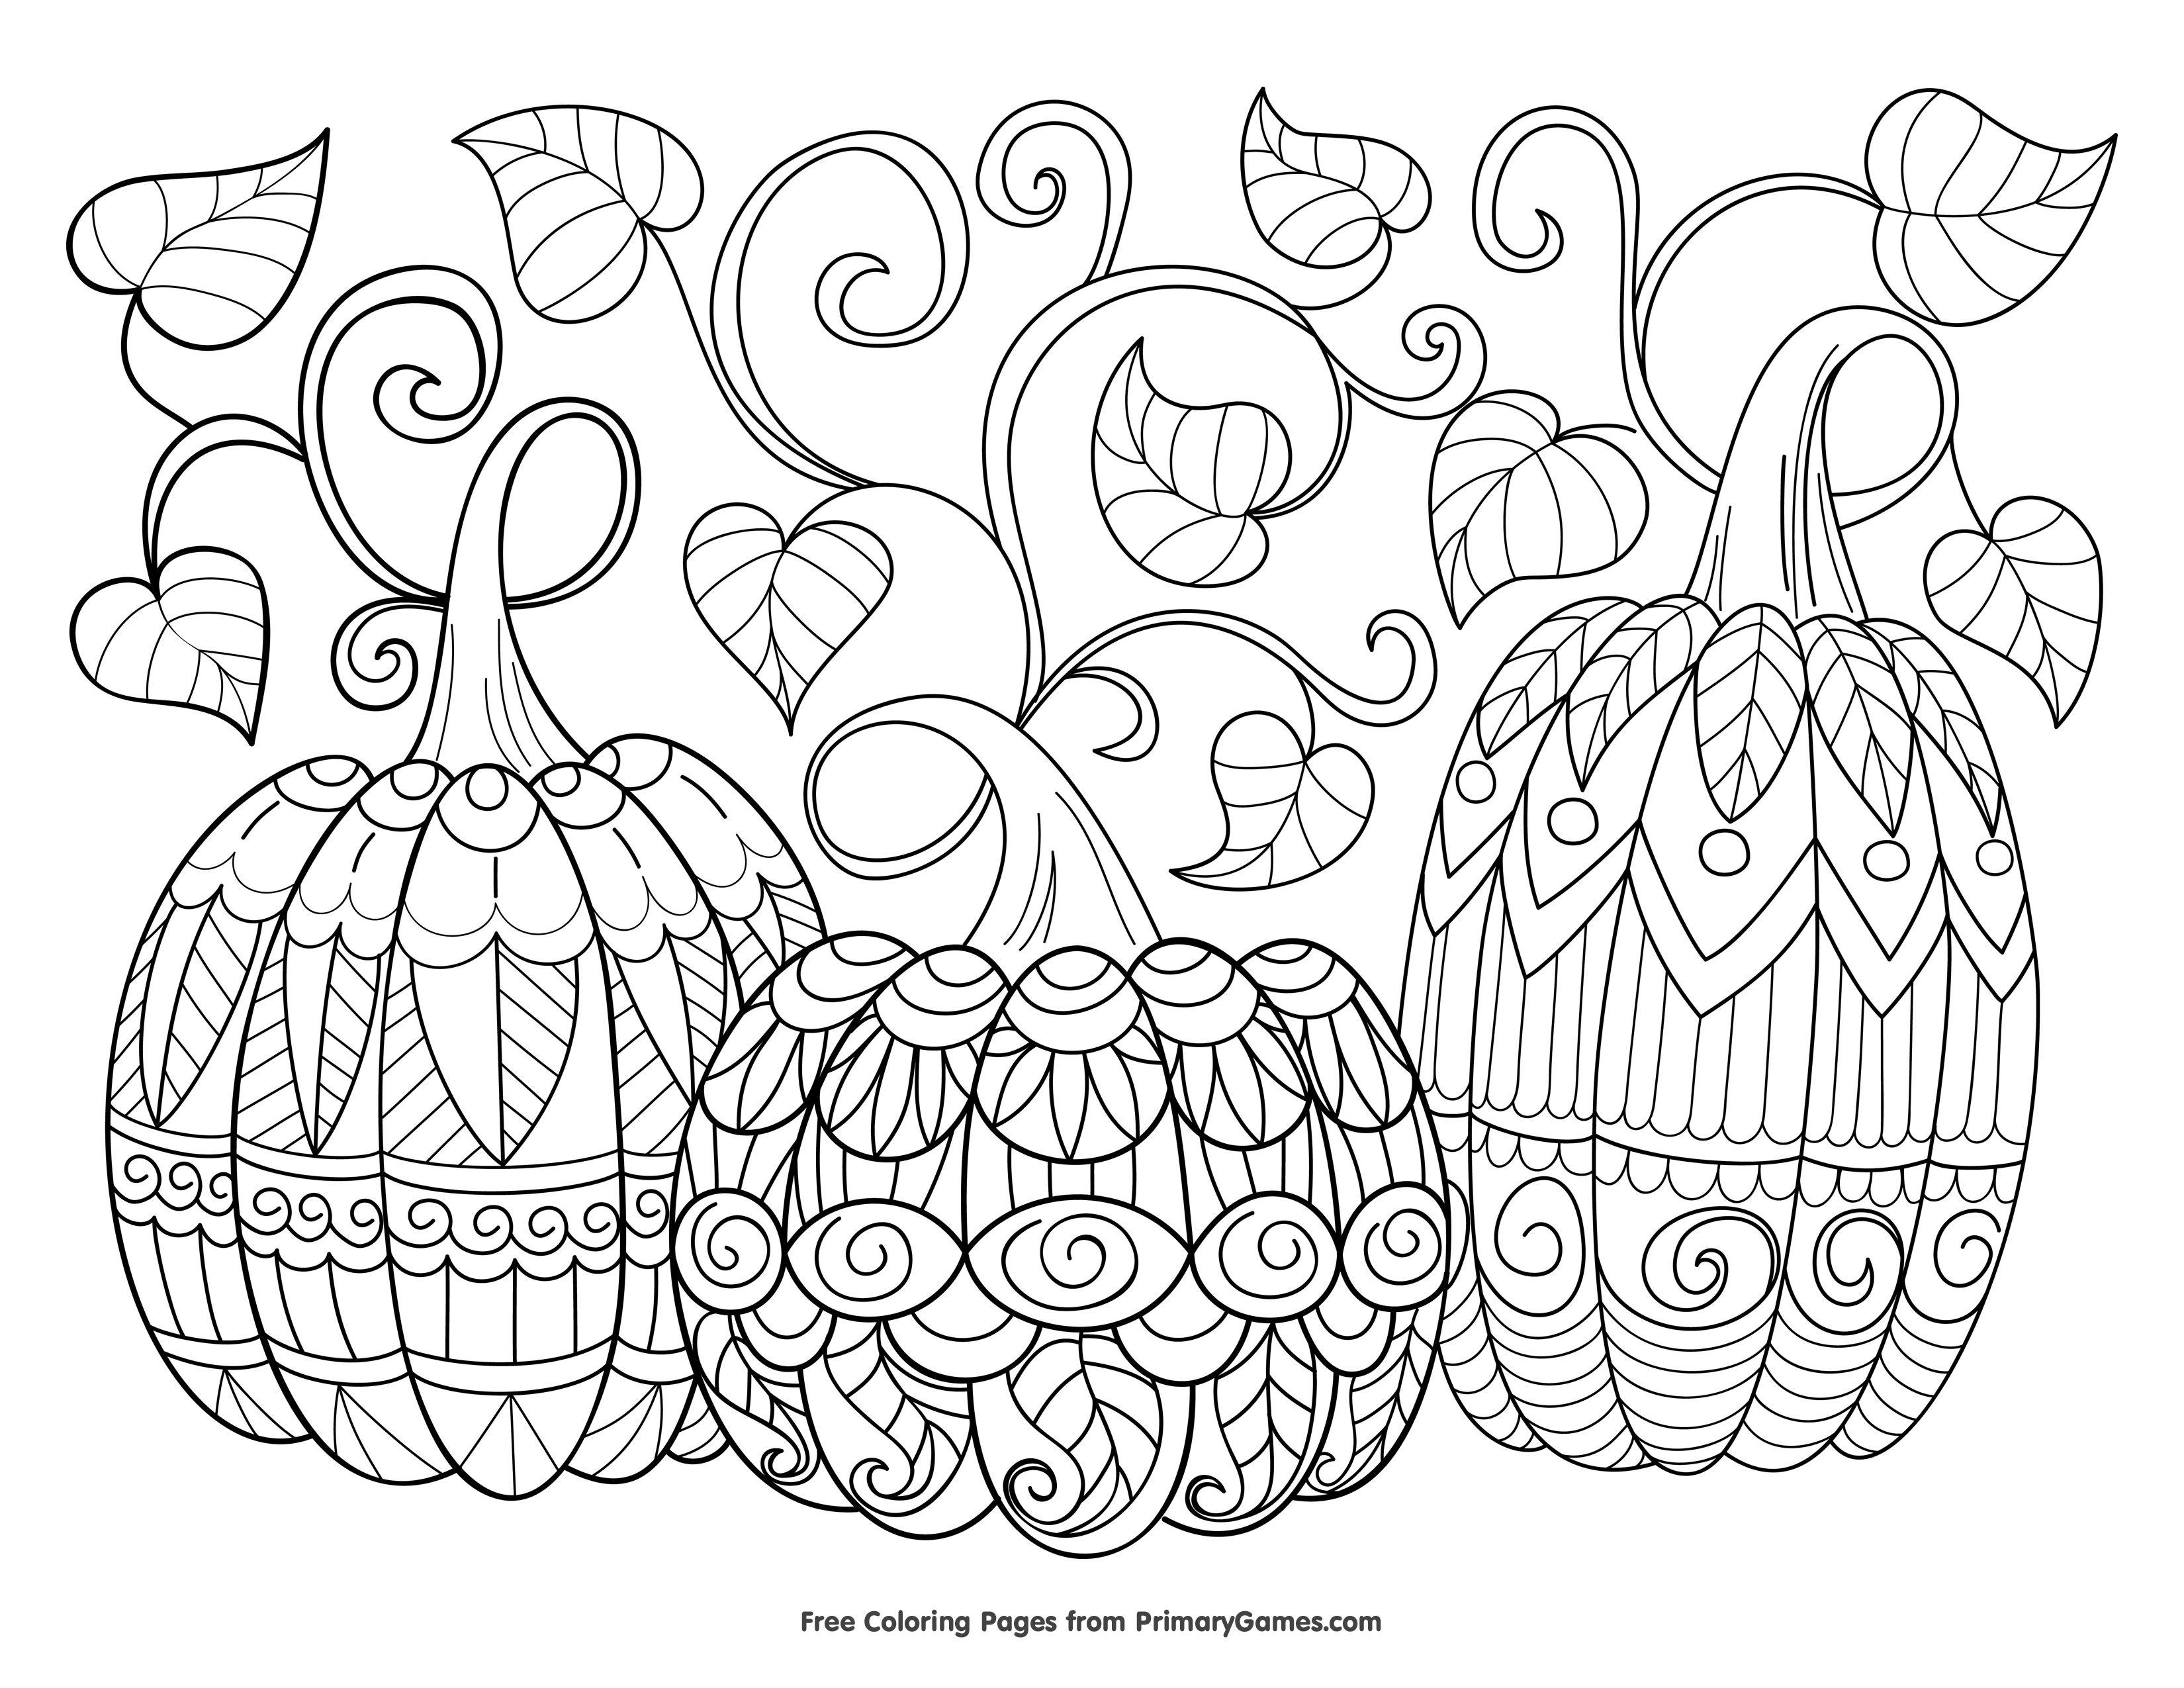 Three Pumpkins Coloring Page Free Printable Ebook Free